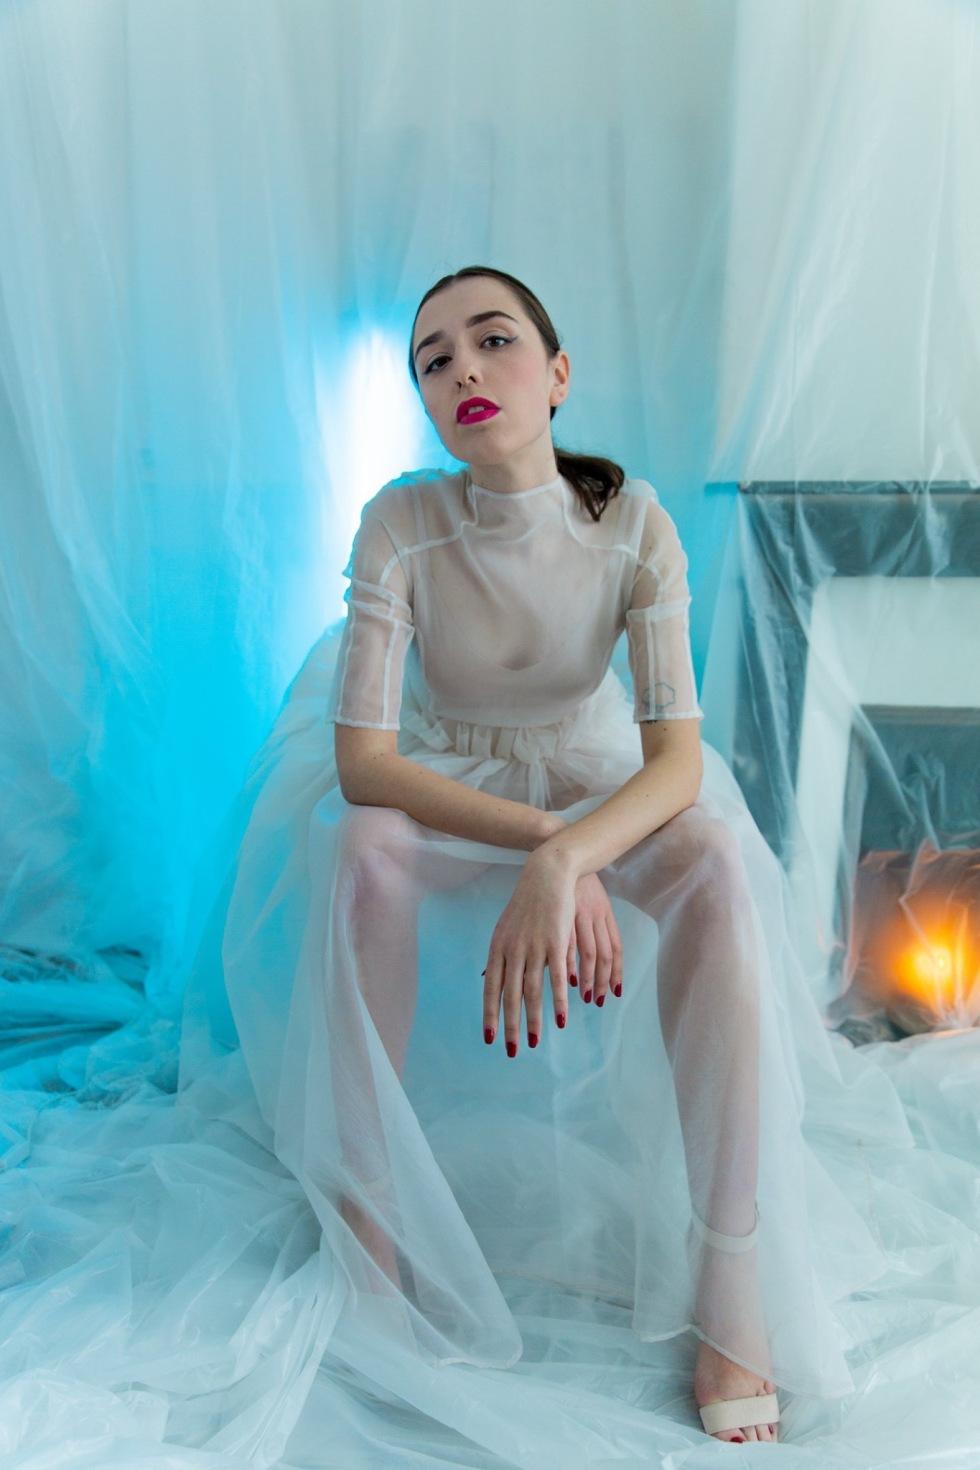 Photographer: Laura Zorman Model: Viktoria Kirkevich